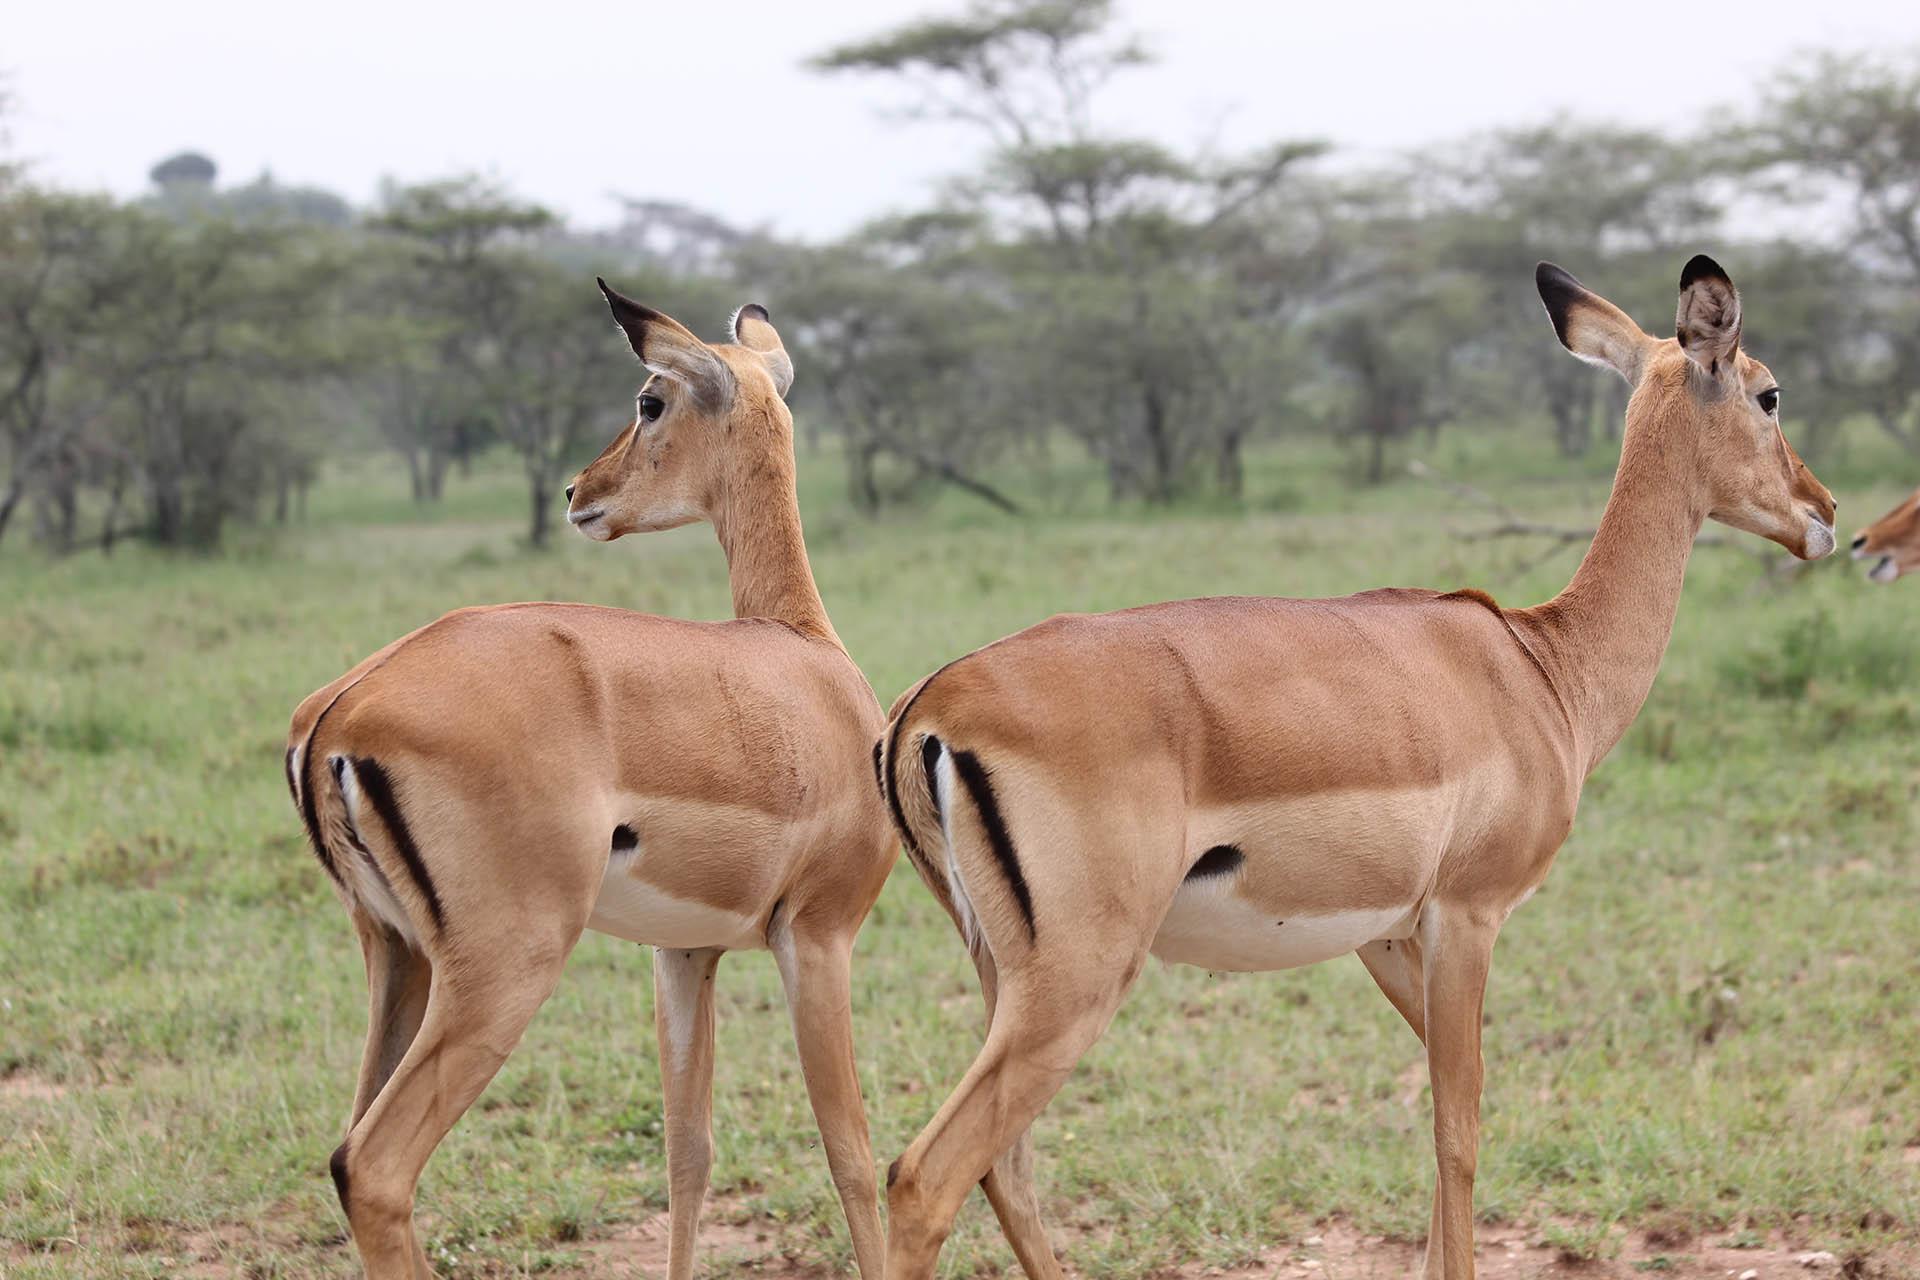 Amazing 5 Days Ruaha Safari